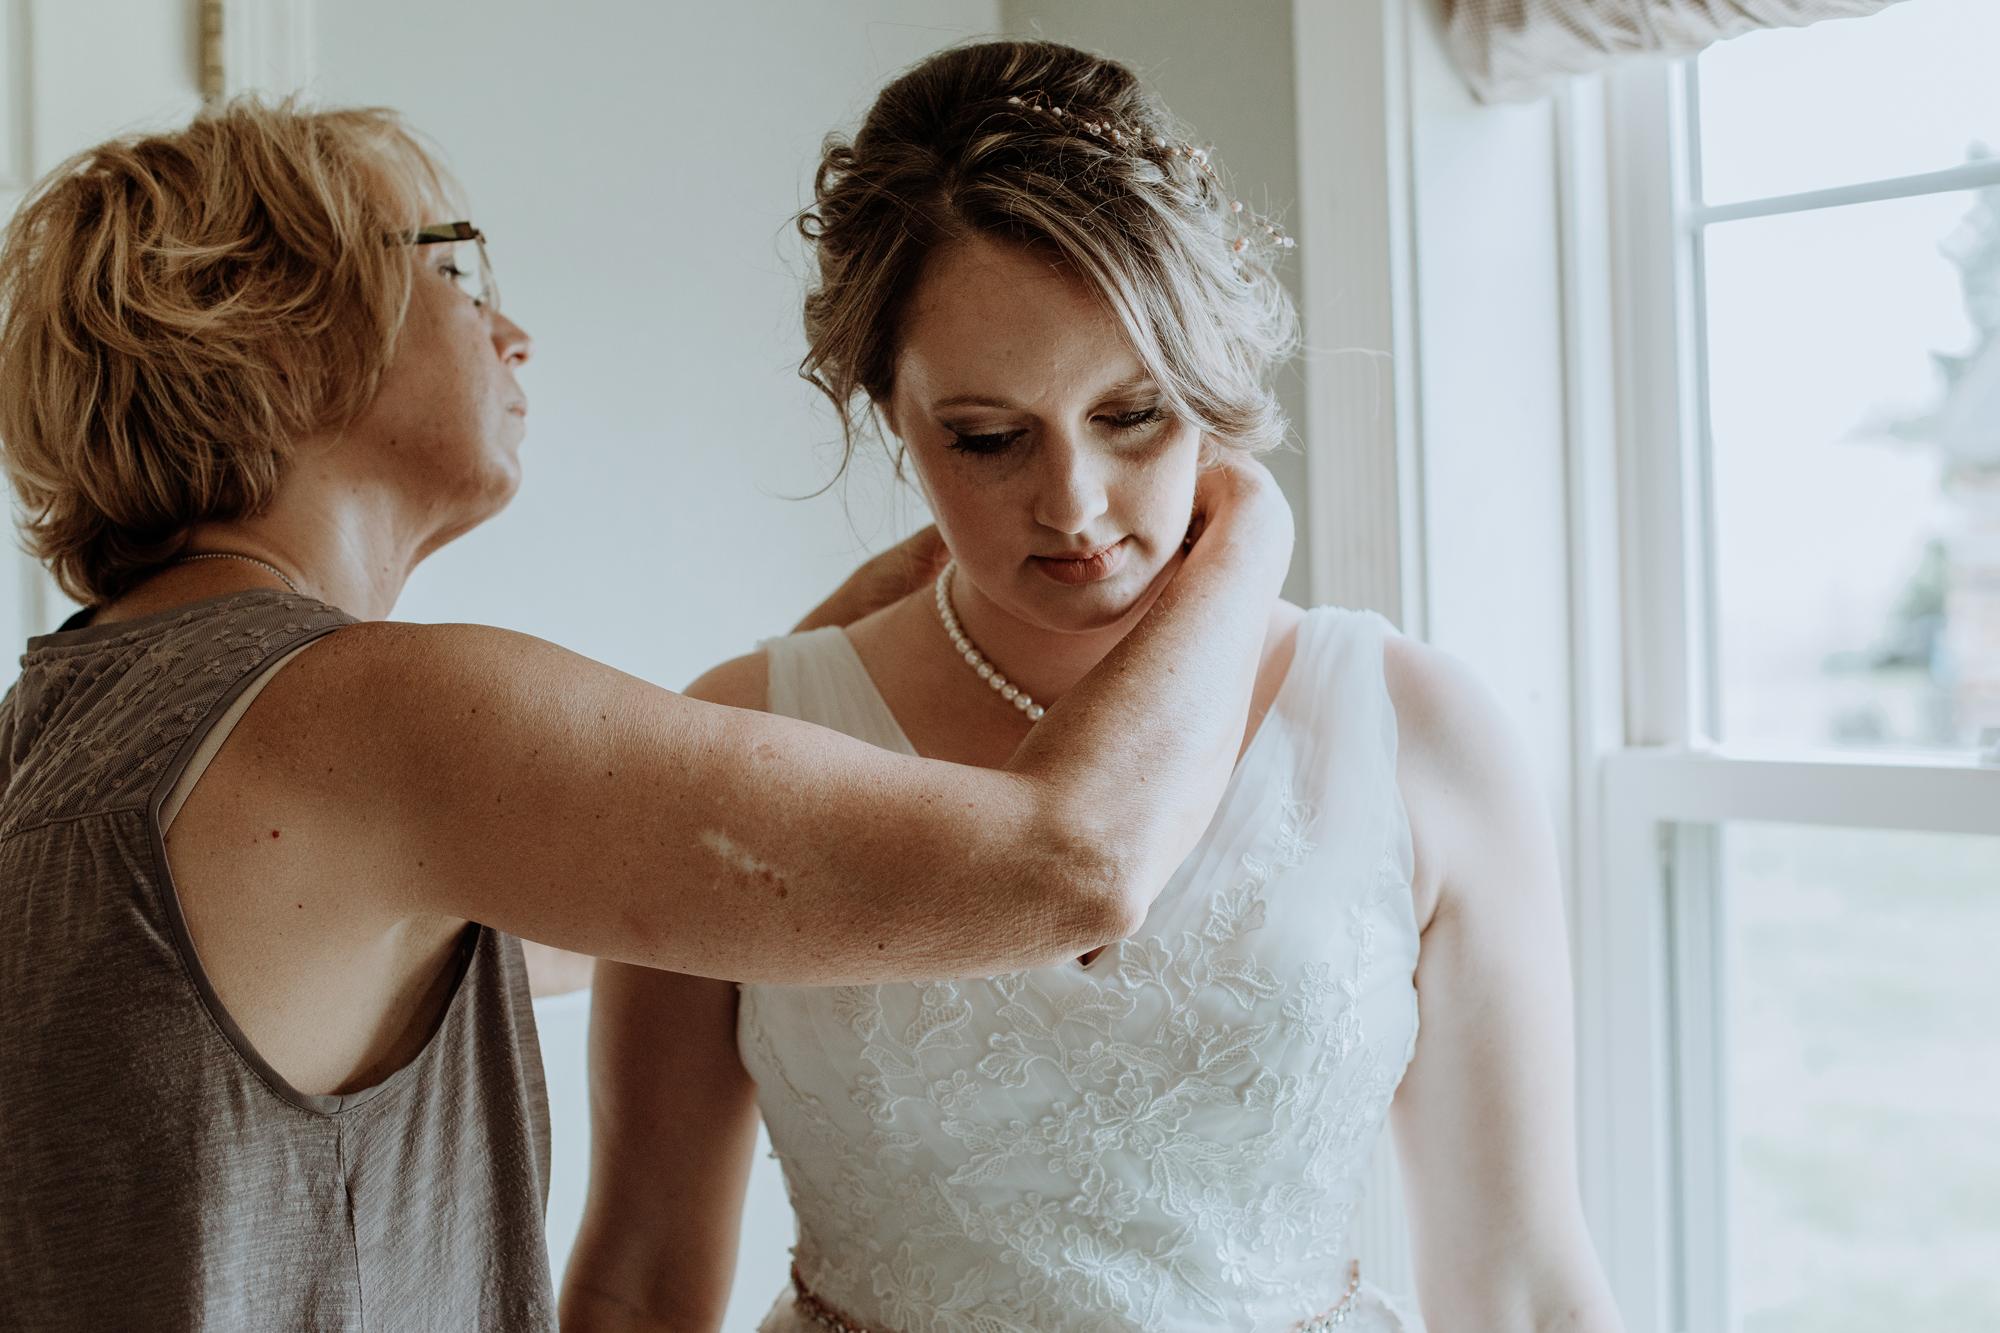 mom-daughter-getting-ready-wedding-photo